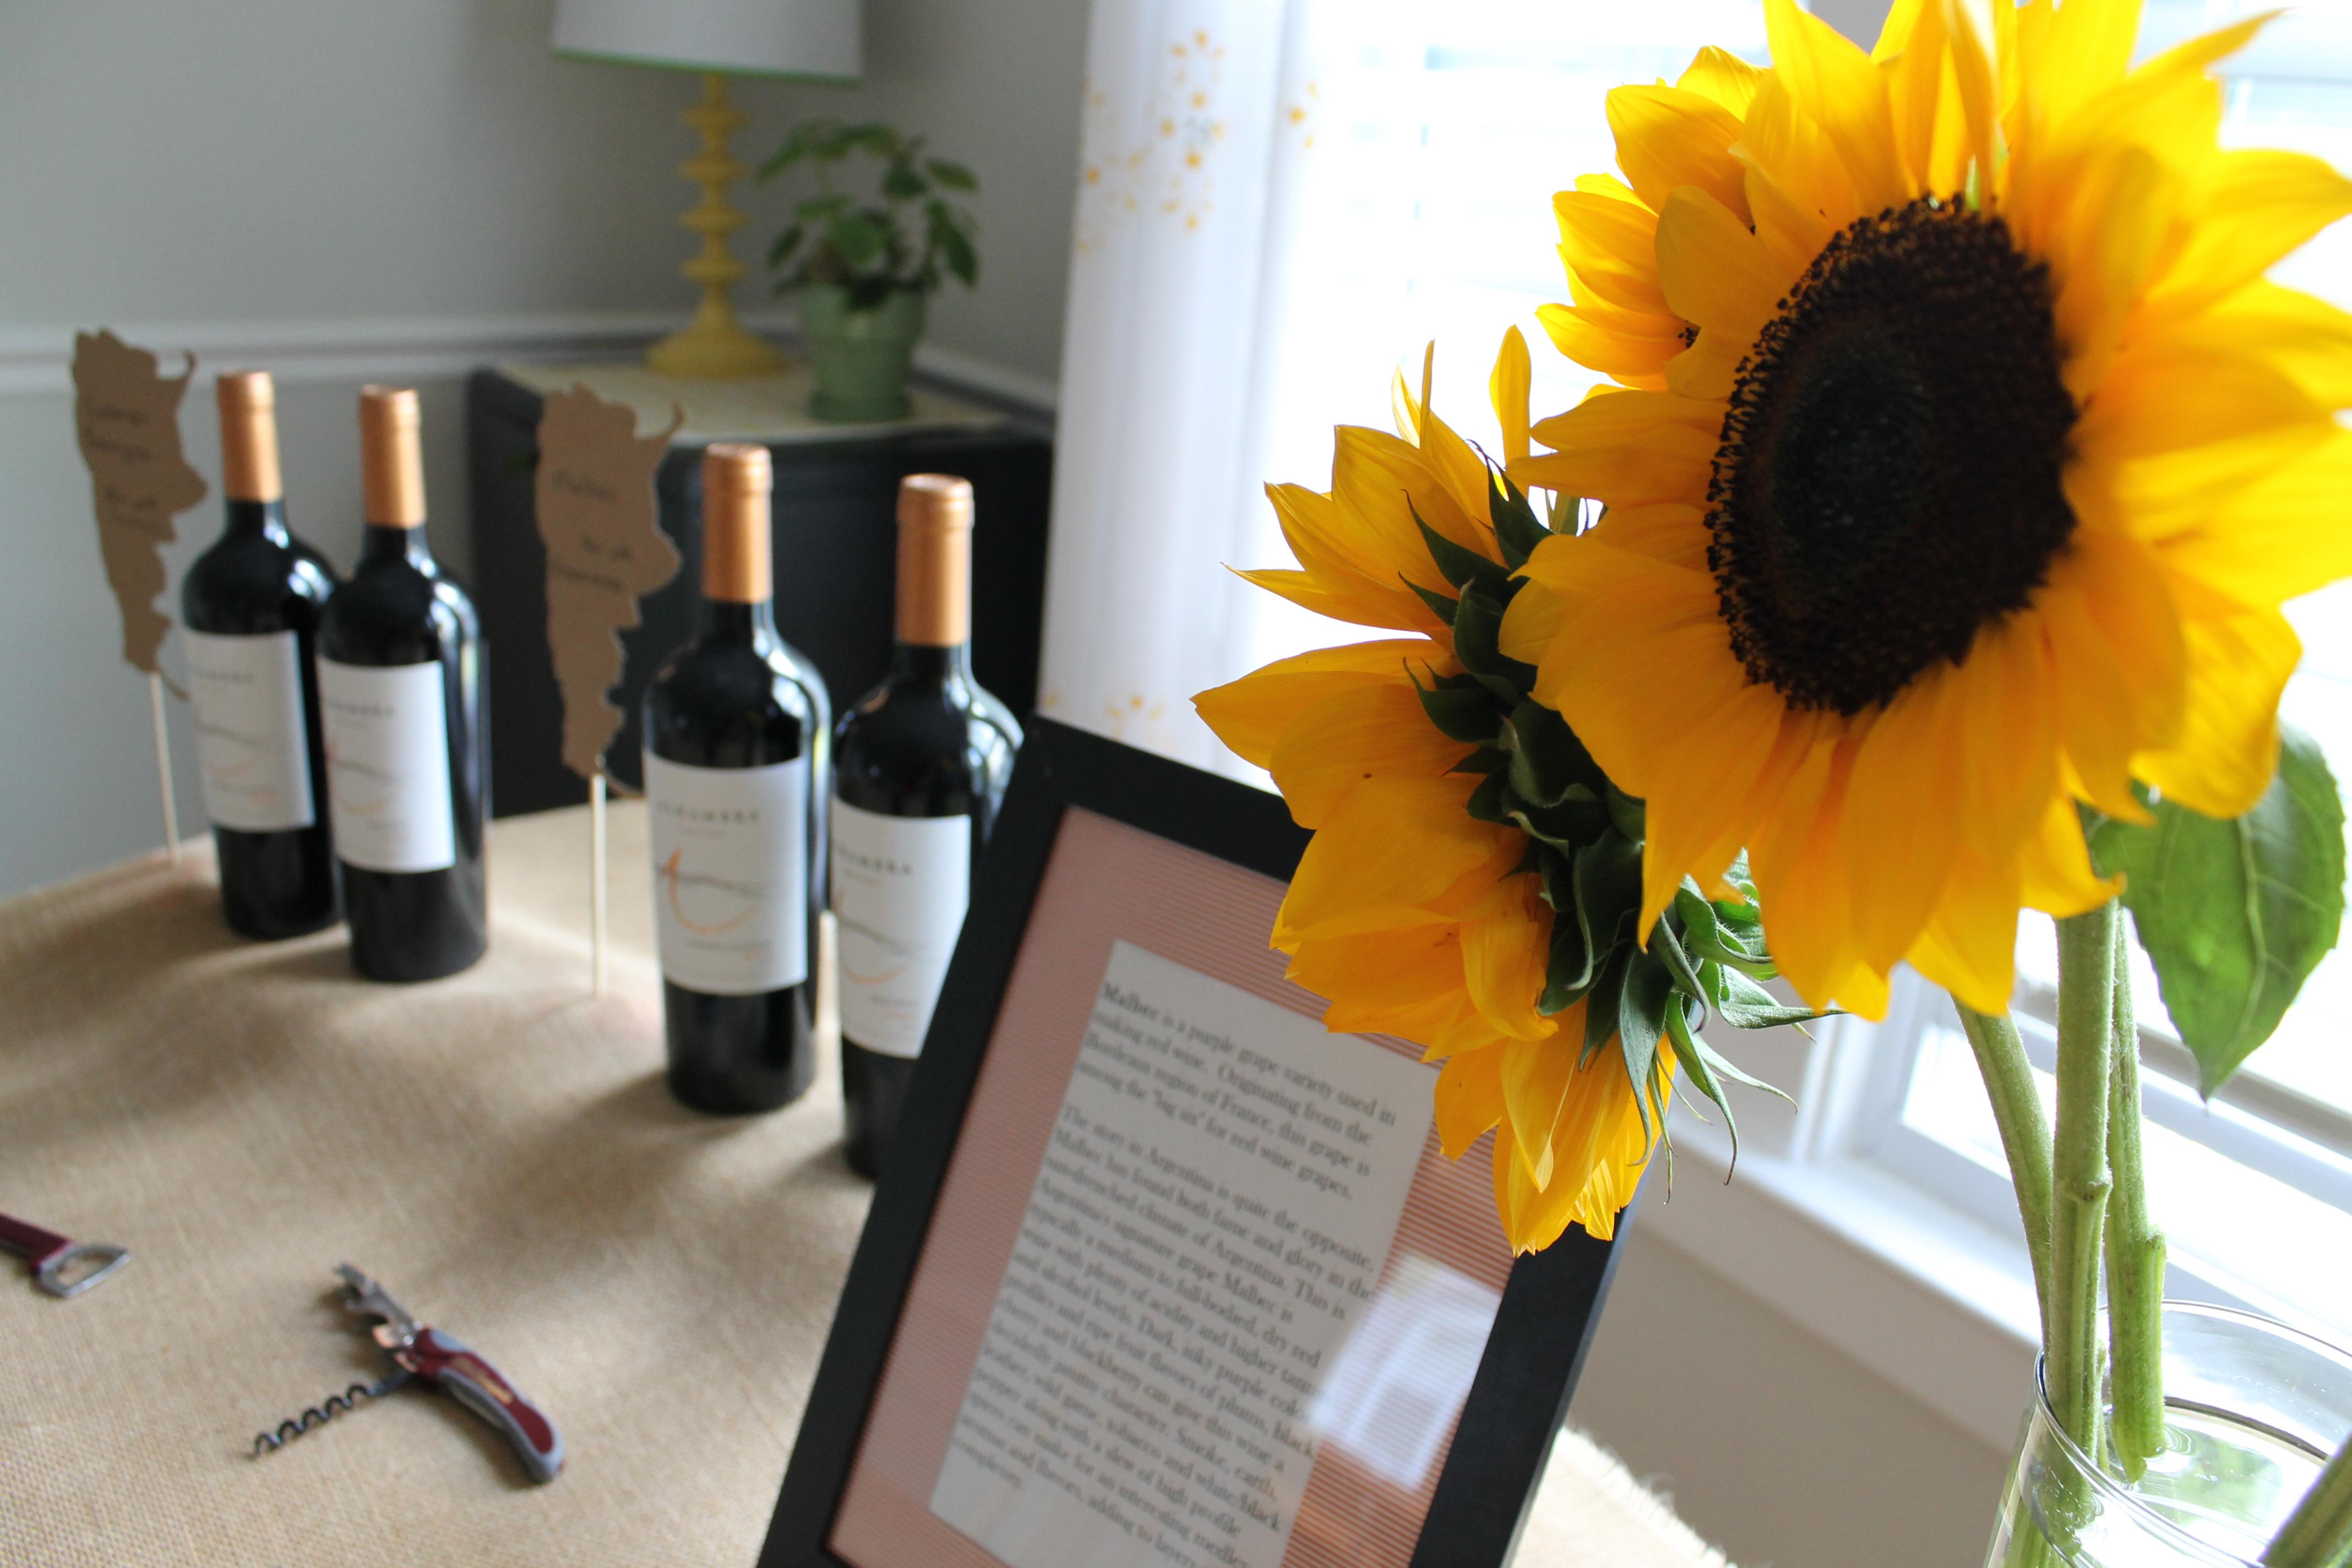 Wine crawl better flowers - Our Wine Crawl - Take 2